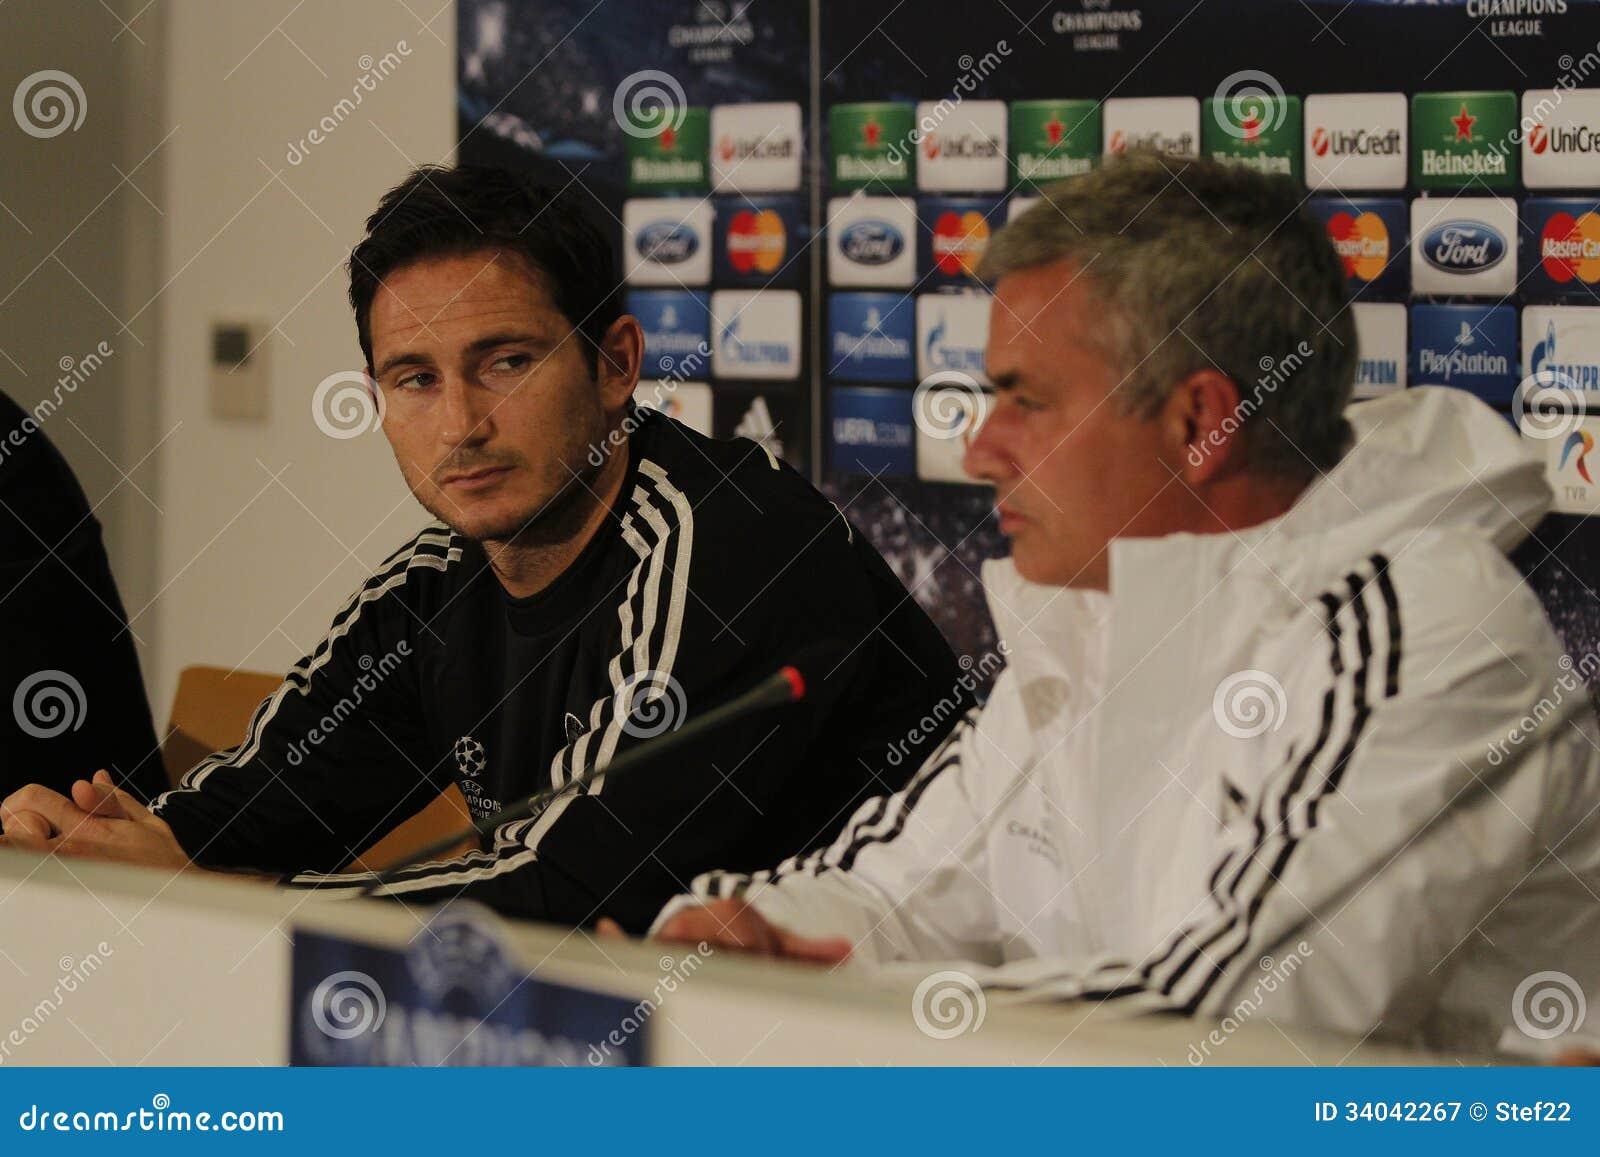 Jose Mourinho and Frank Lampard